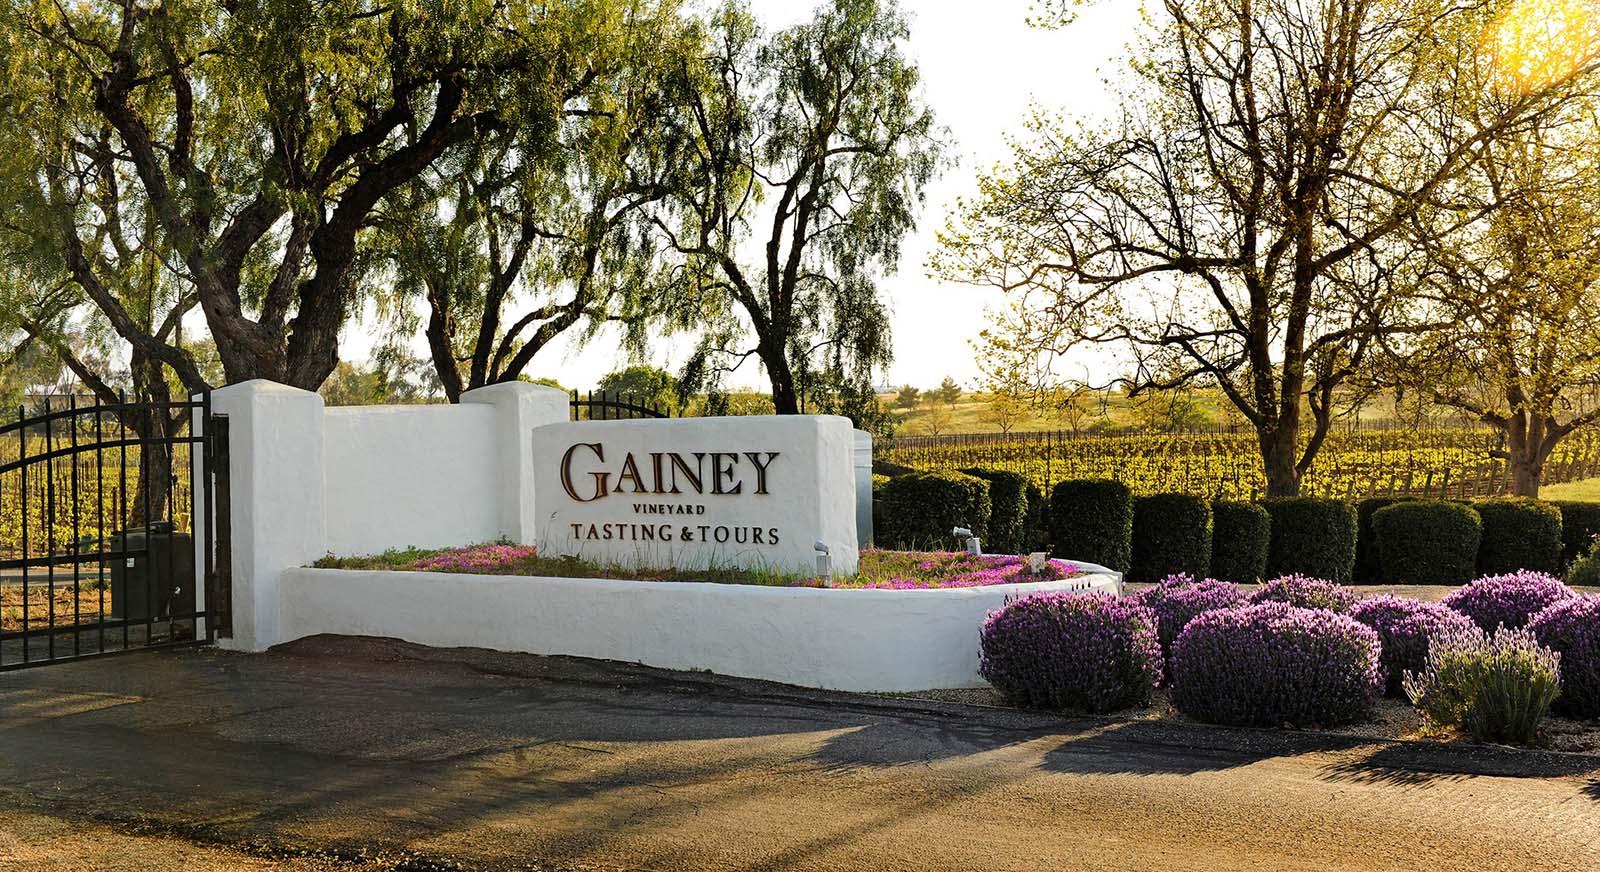 Gainey Vineyard in Santa Ynez Valley